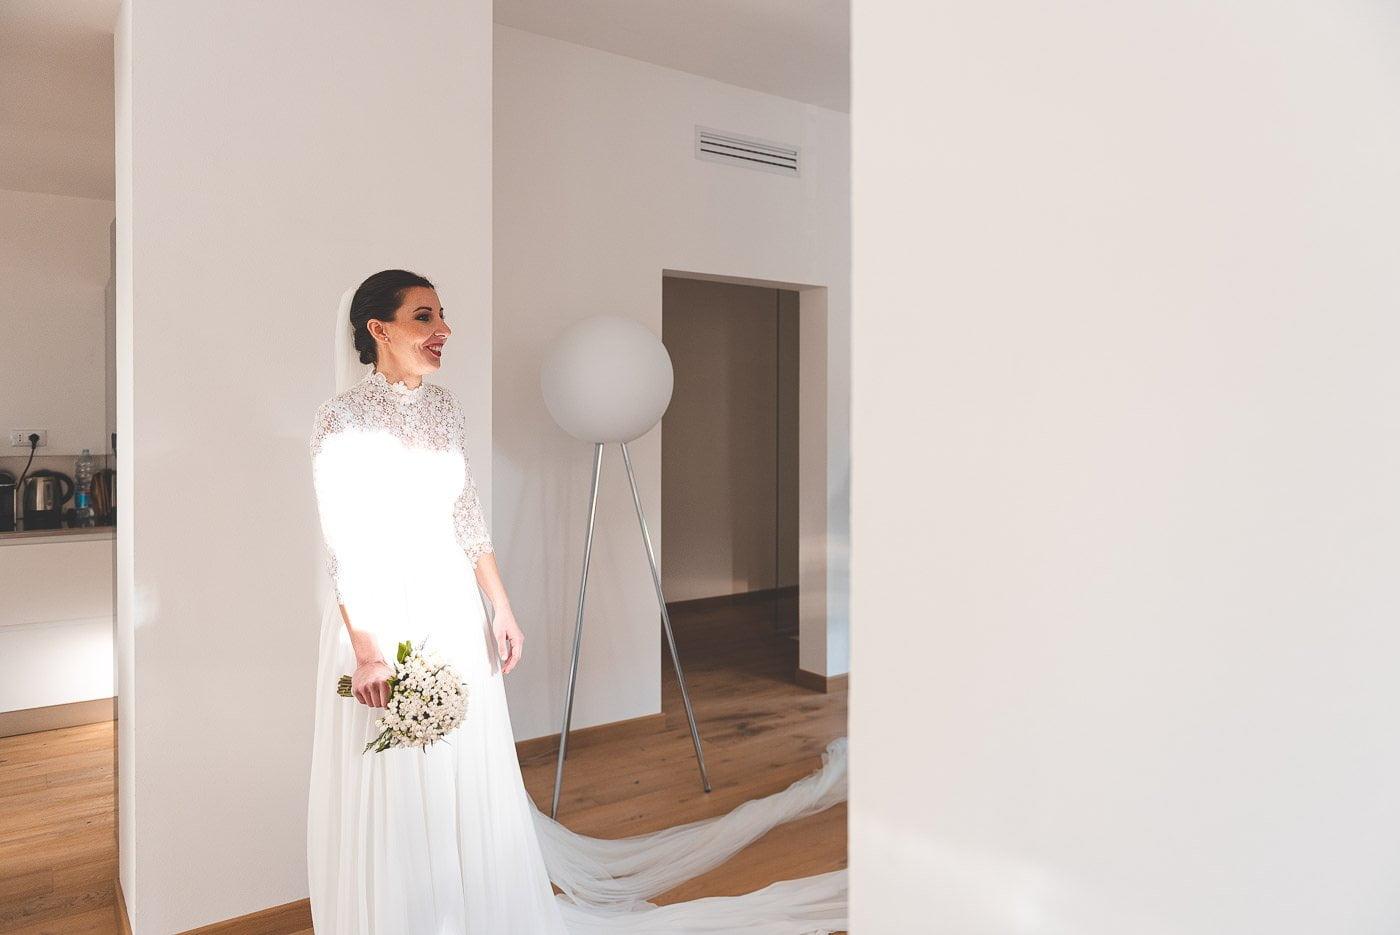 Matrimonio Giulia & Alessandro 28_12 – Alessio Nobili Photographer-7